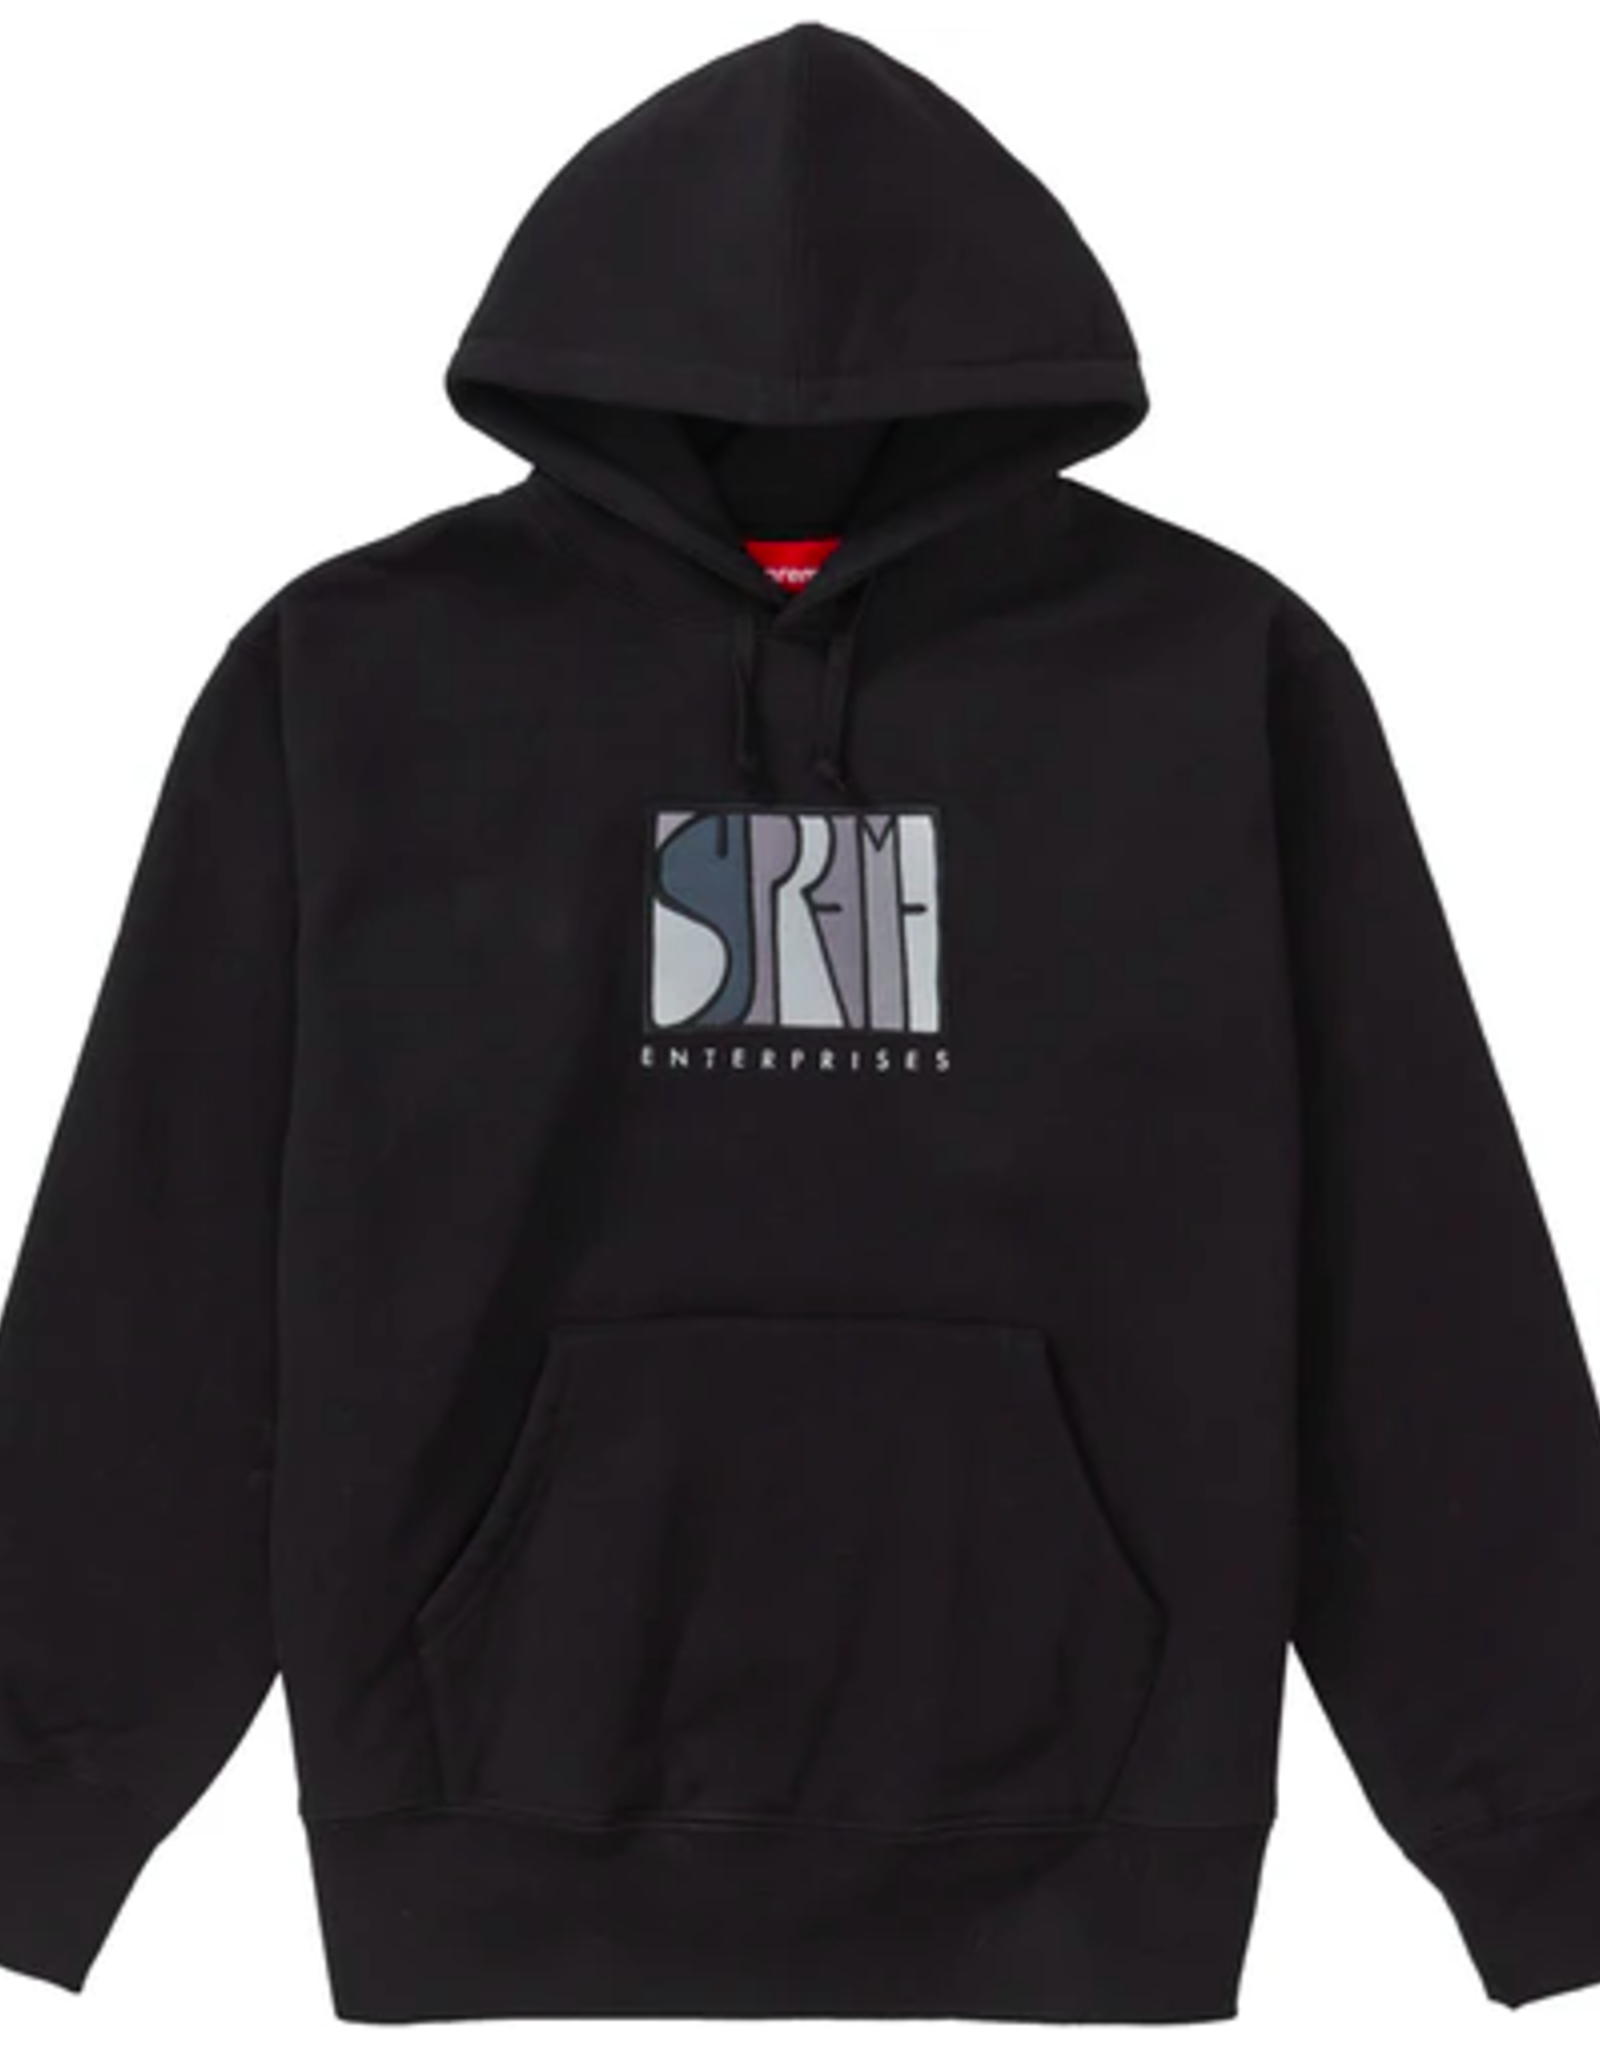 SUPREME Supreme Enterprises Hooded Sweatshirt Black - Medium